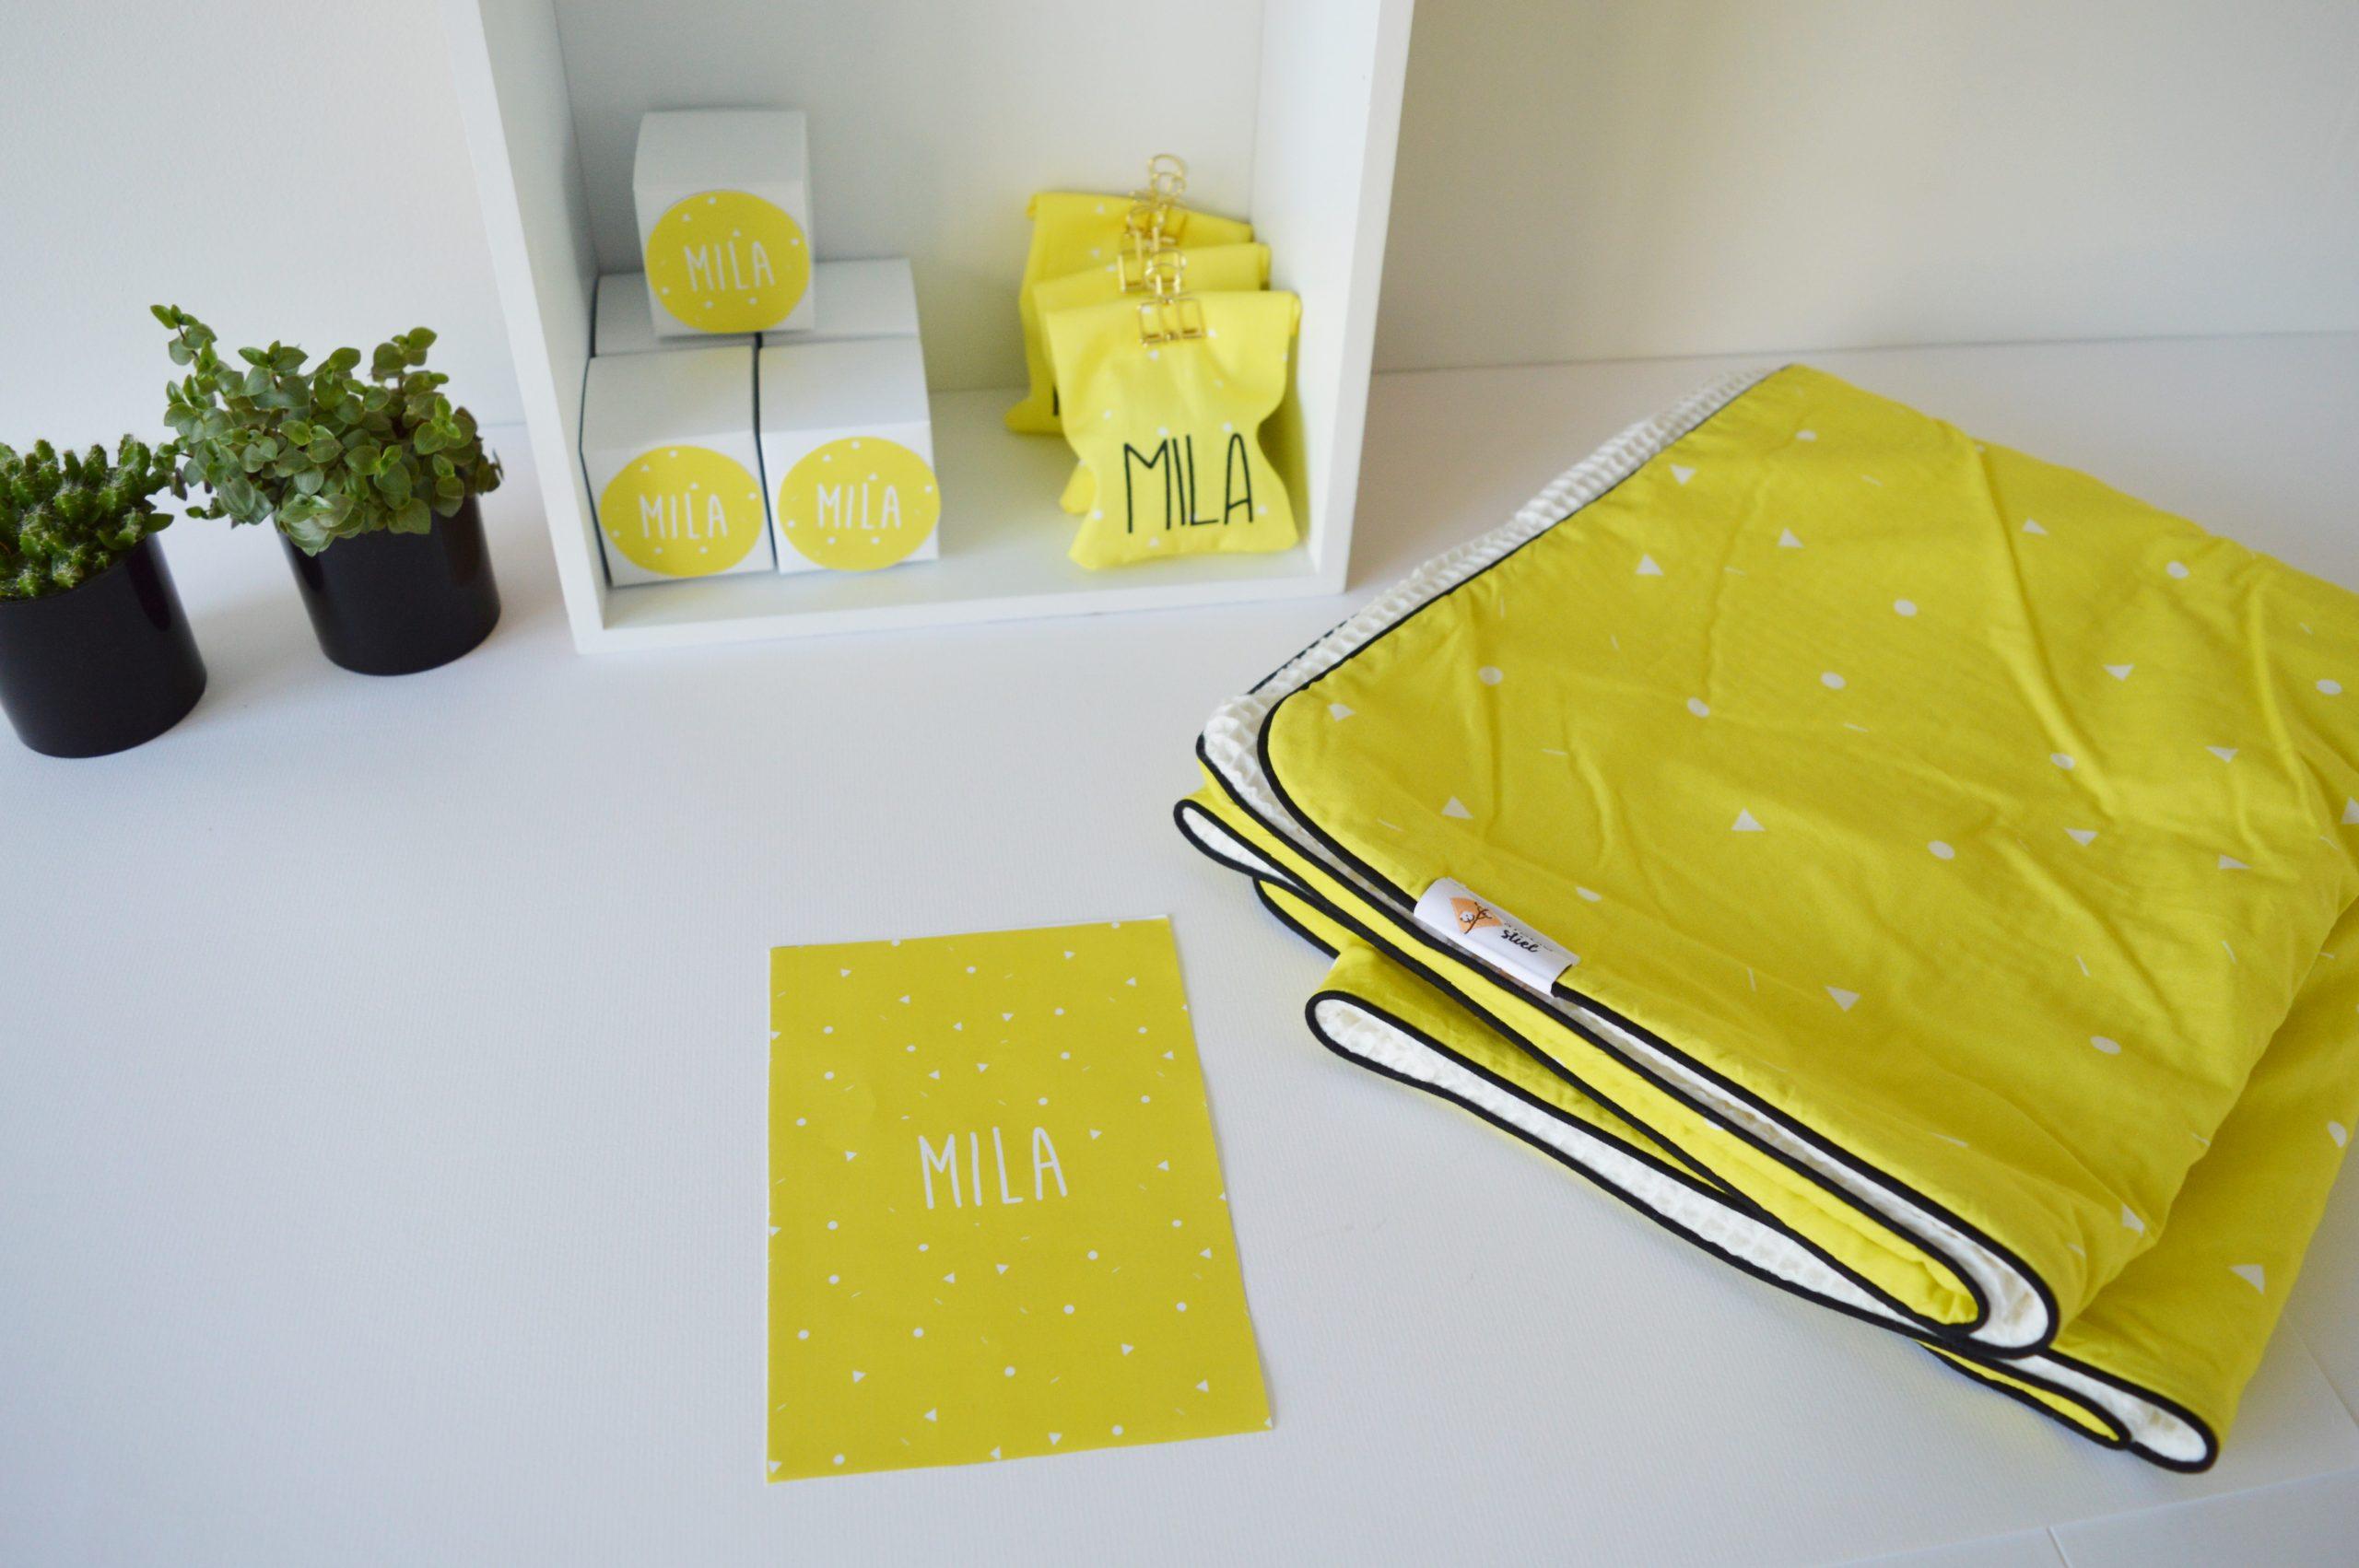 Doopsuiker dekentje en kaartje Mila